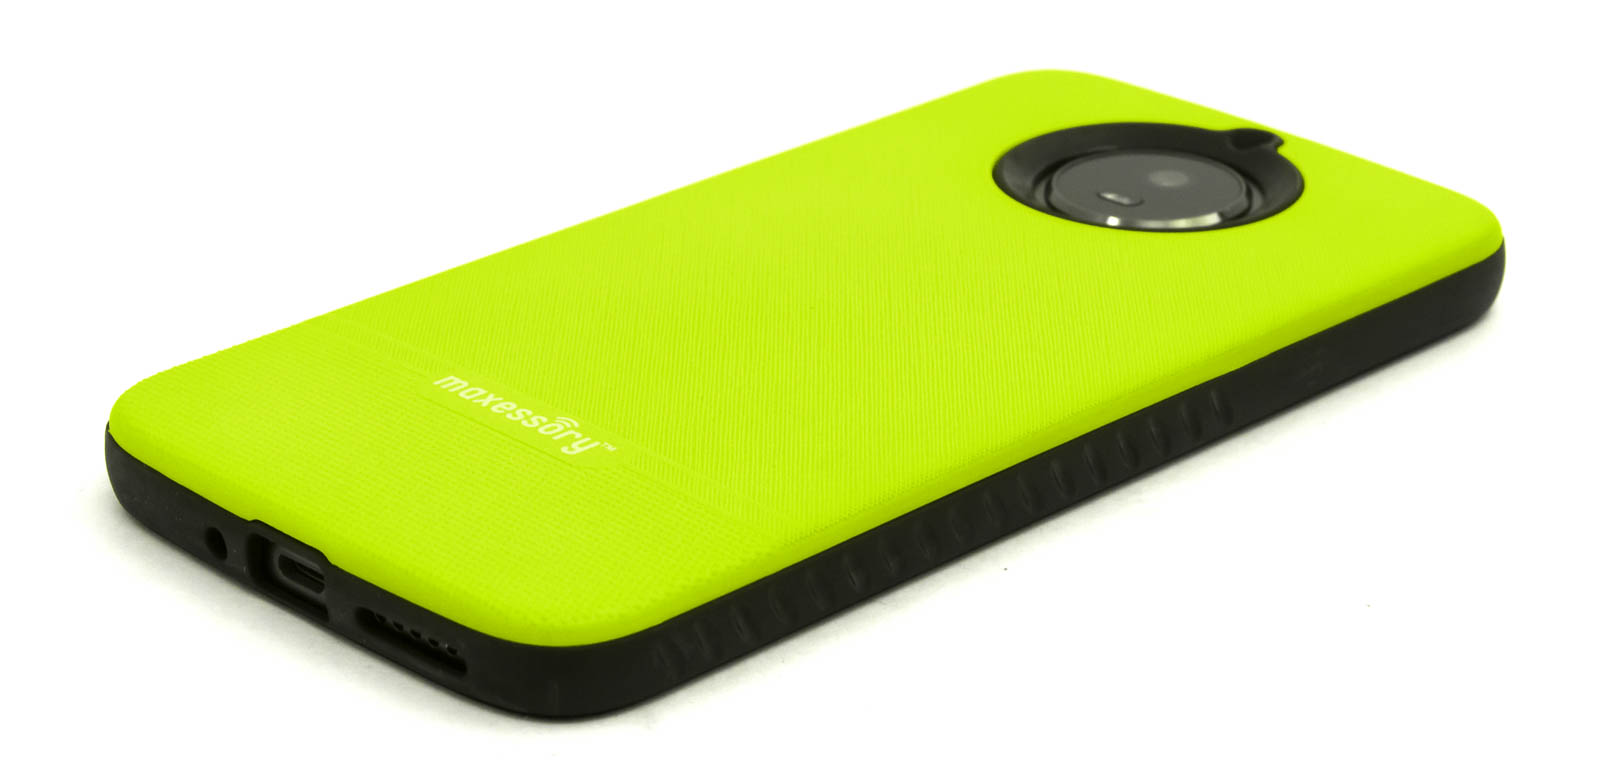 Moto-G5s-Case-Moto-G6-Case-Ultra-Thin-Hard-Body-Tactile-Shell-Cover thumbnail 21